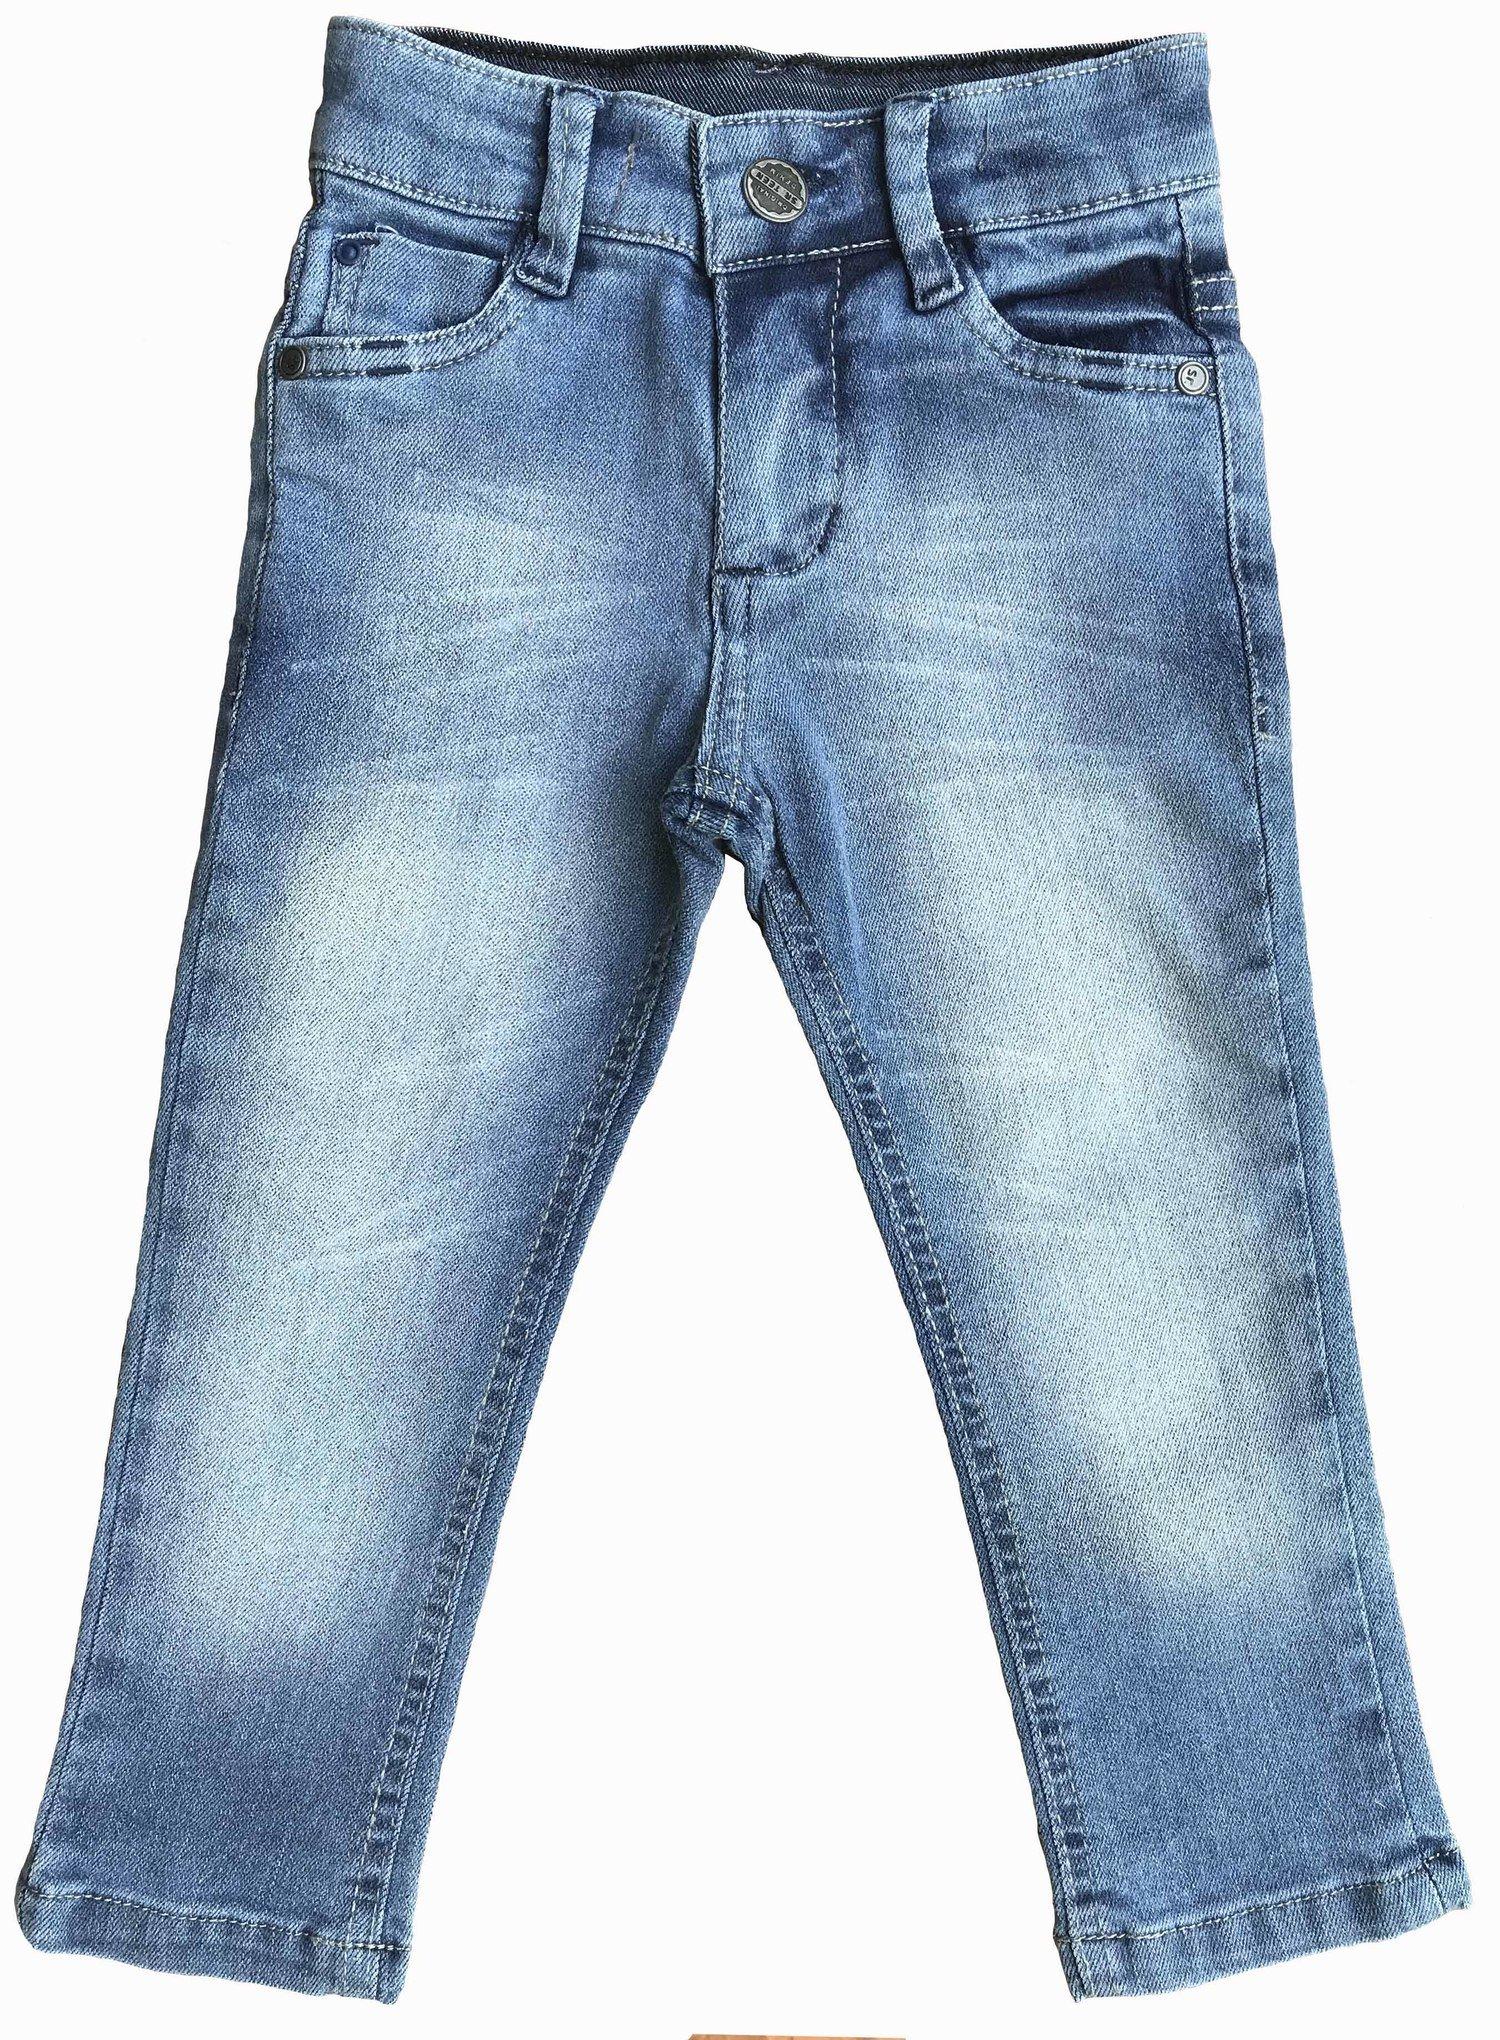 Calça Masculina Jeans Infantil [306-1]